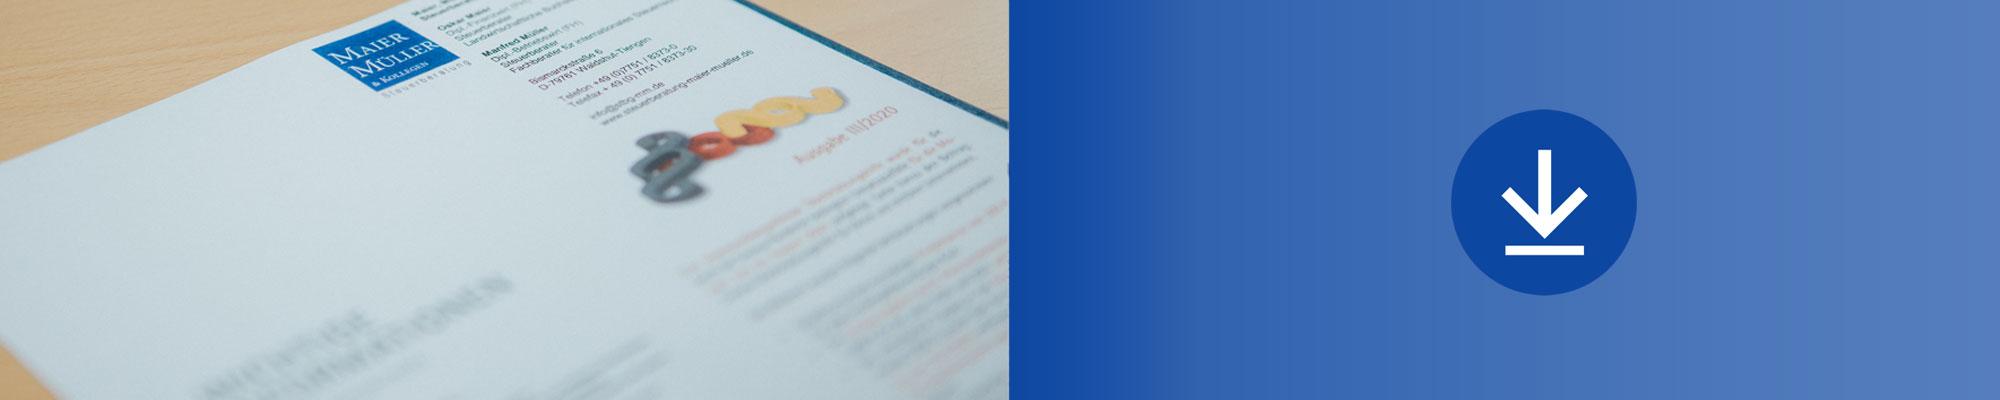 maier-steuerberatung-waldshut-tiengen-newsletter